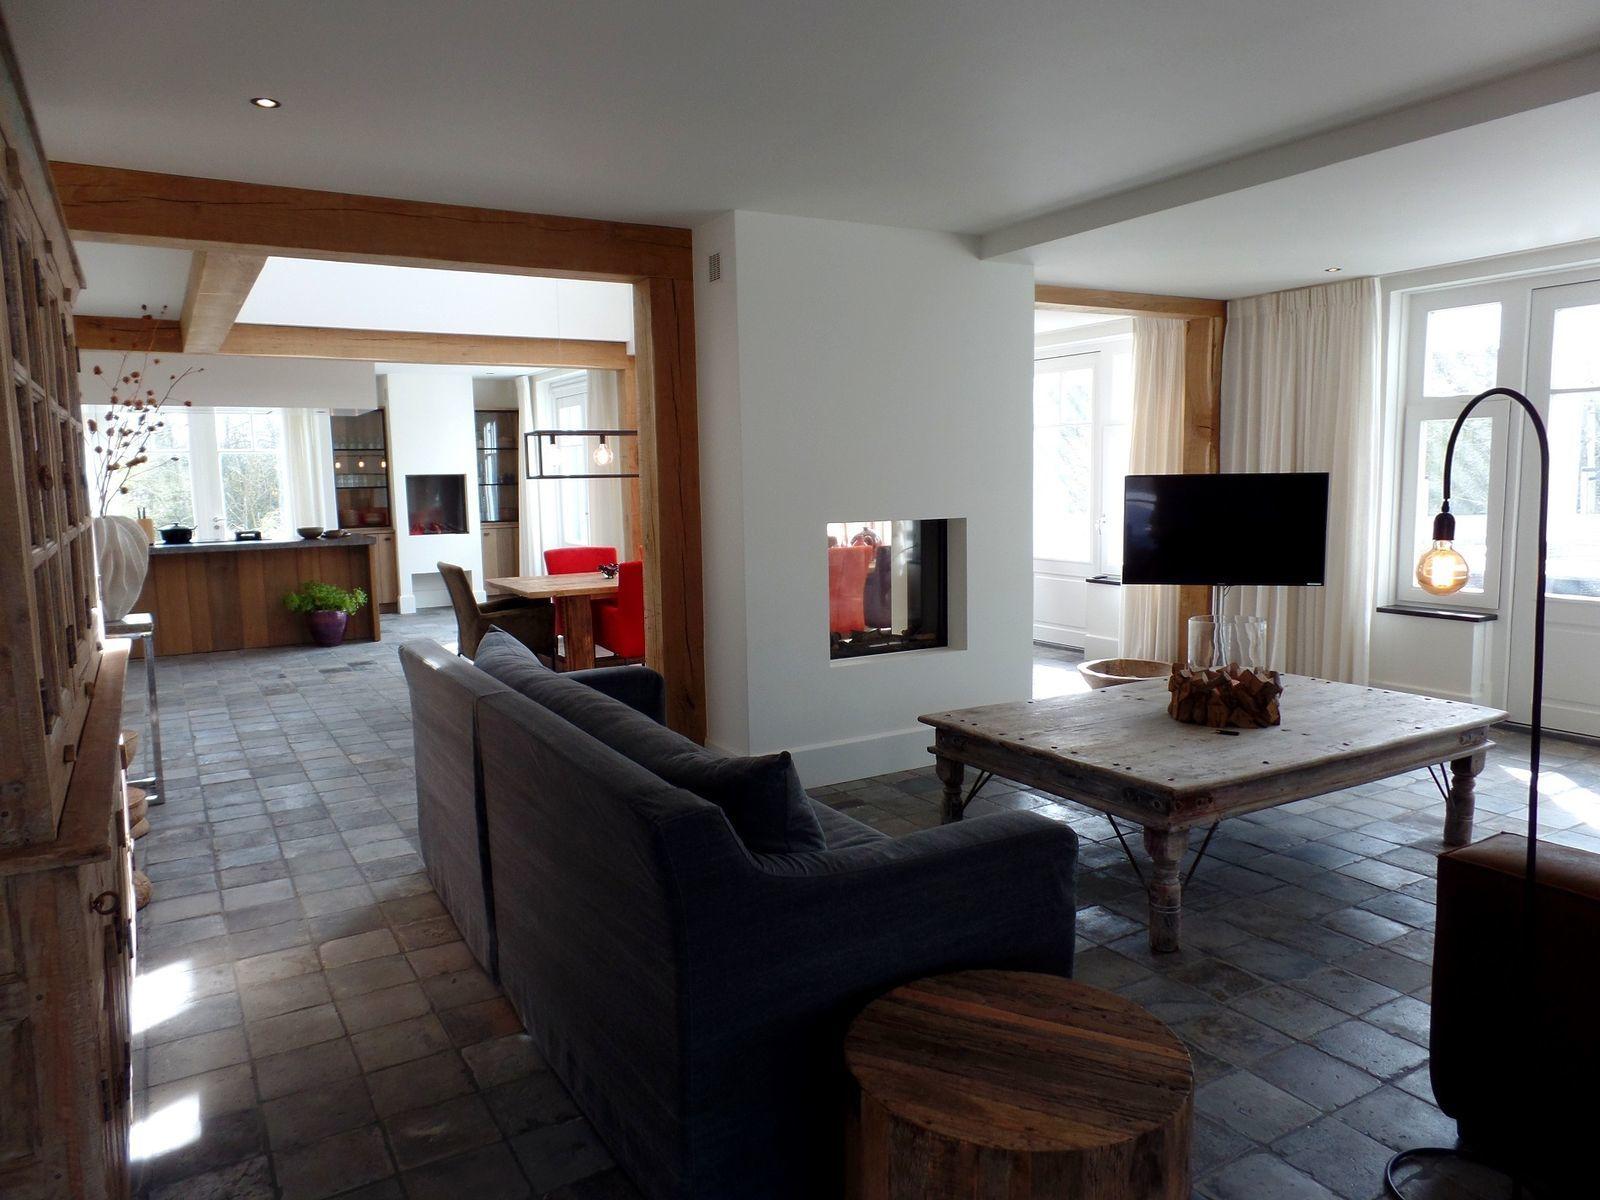 Vakantiehuis - Westerweg 23 | Ouddorp